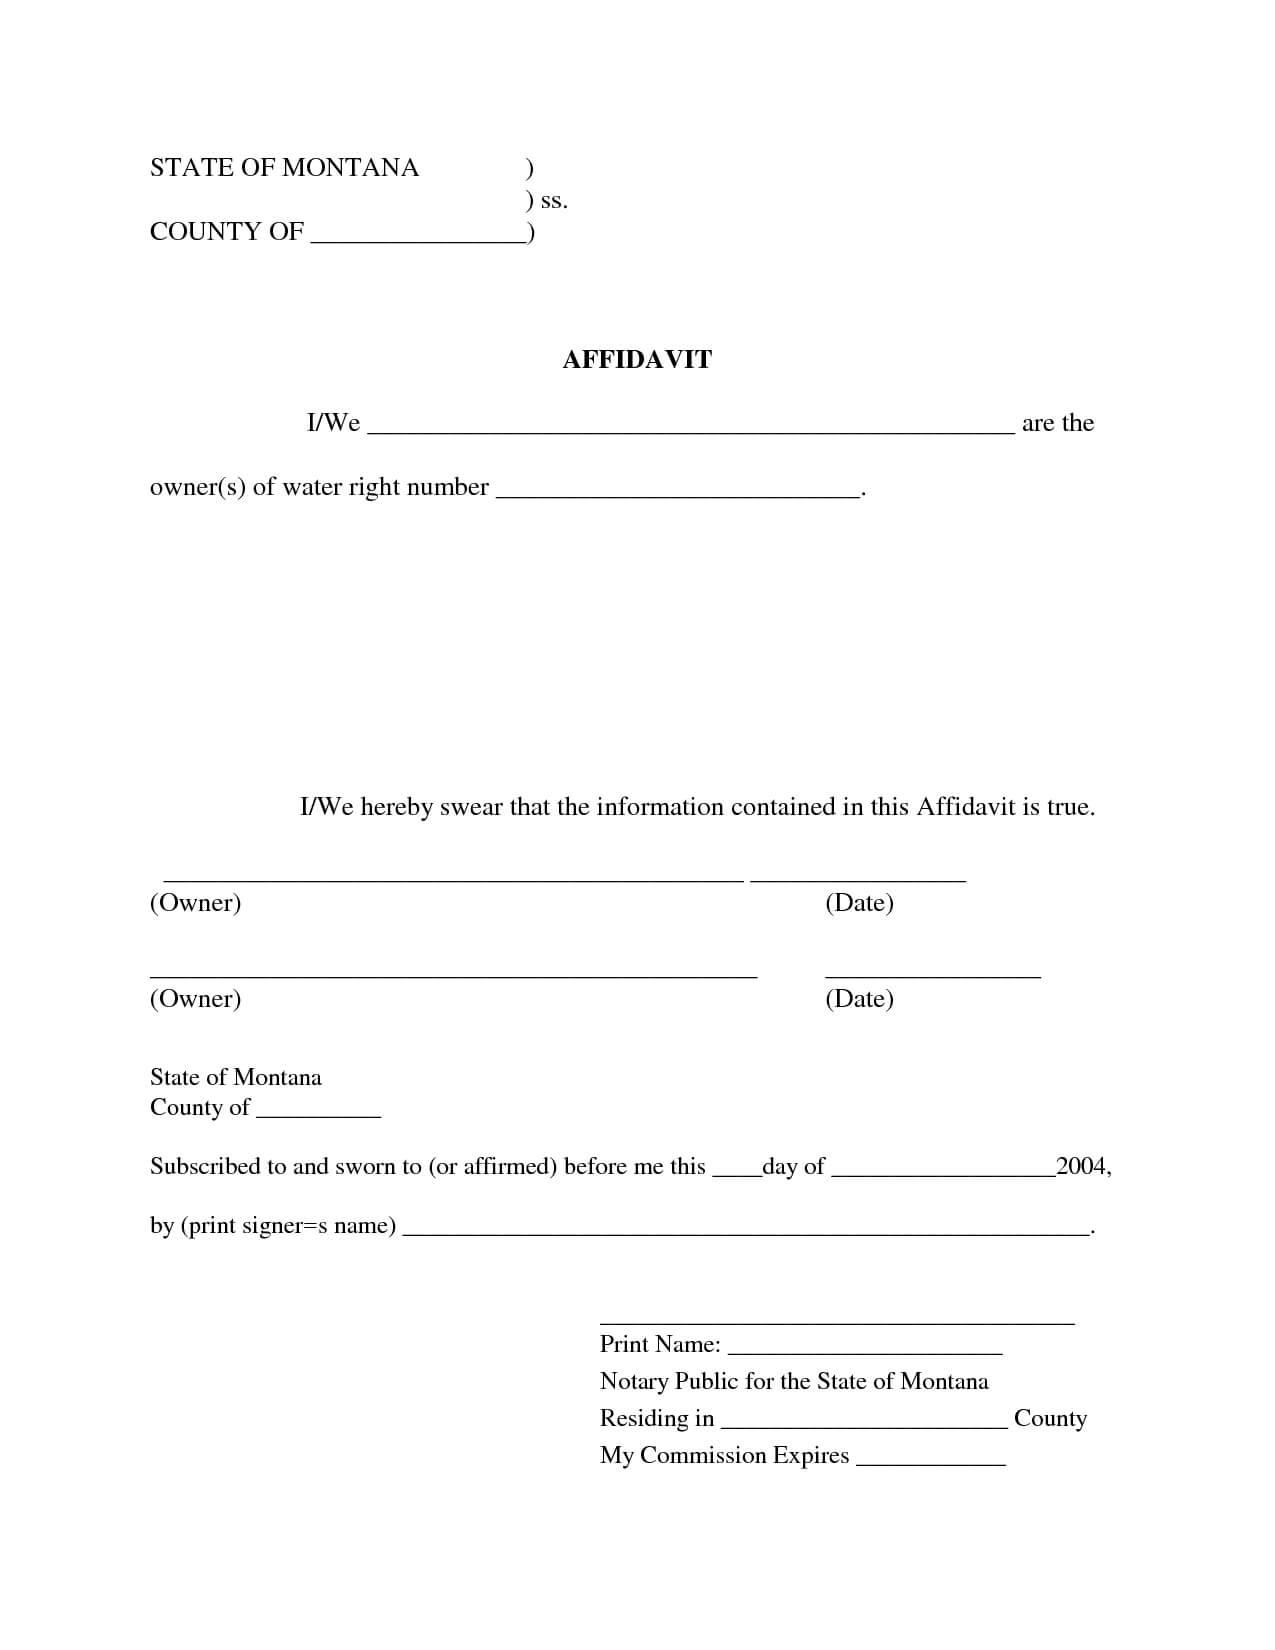 Free Blank Affidavit Form | Blank Sworn Affidavit Forms intended for Blank Legal Document Template